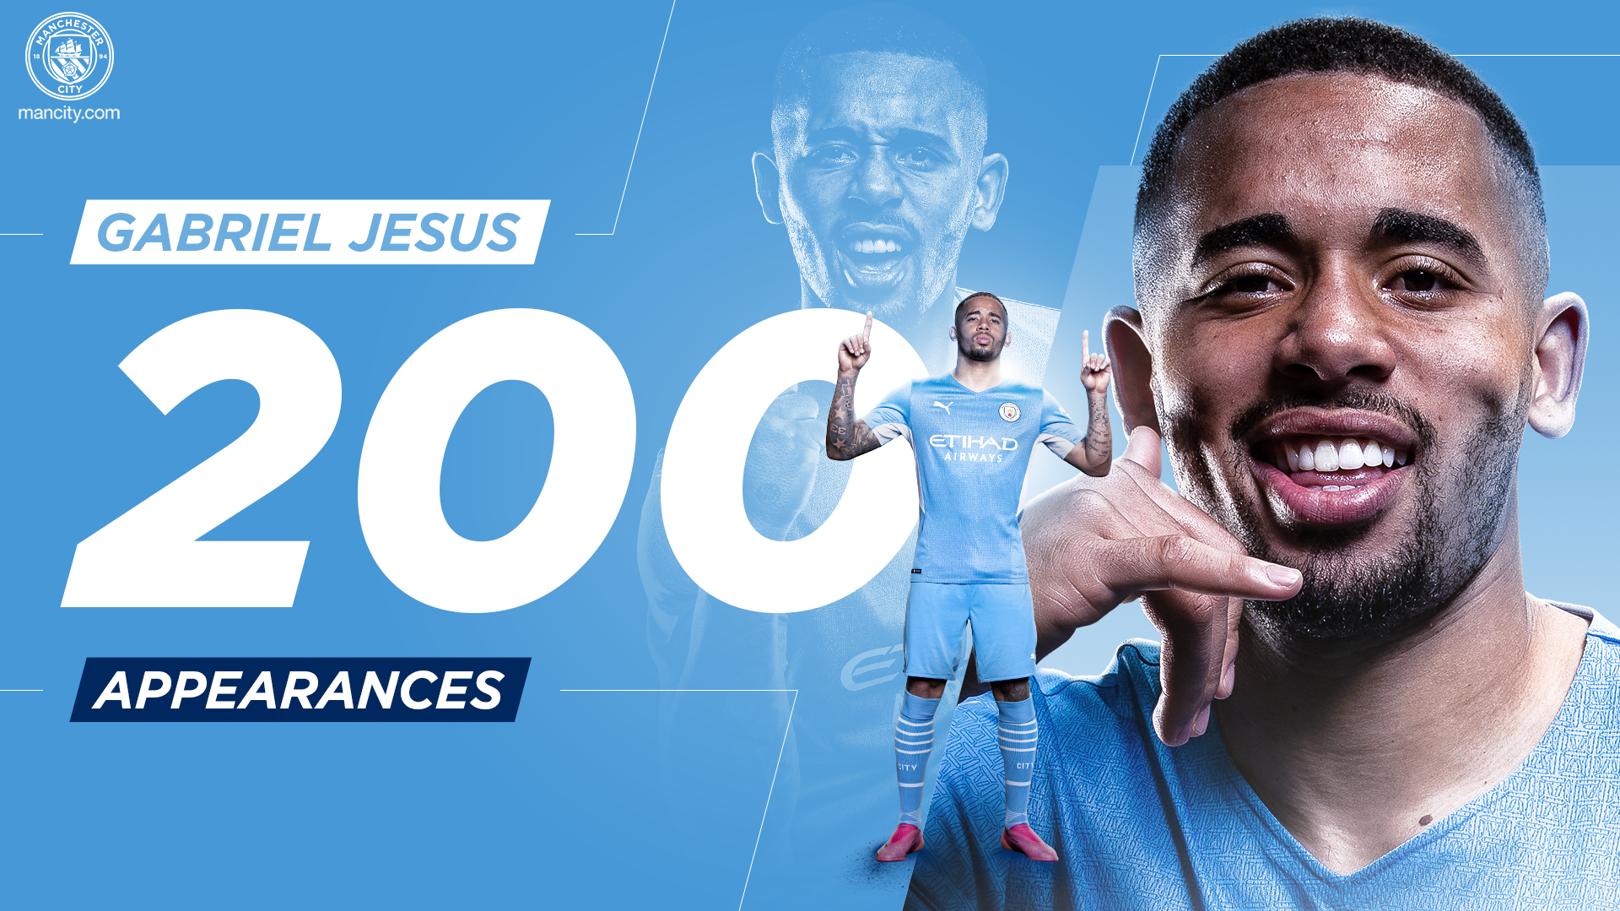 Jesus clocks up 200 appearances for City